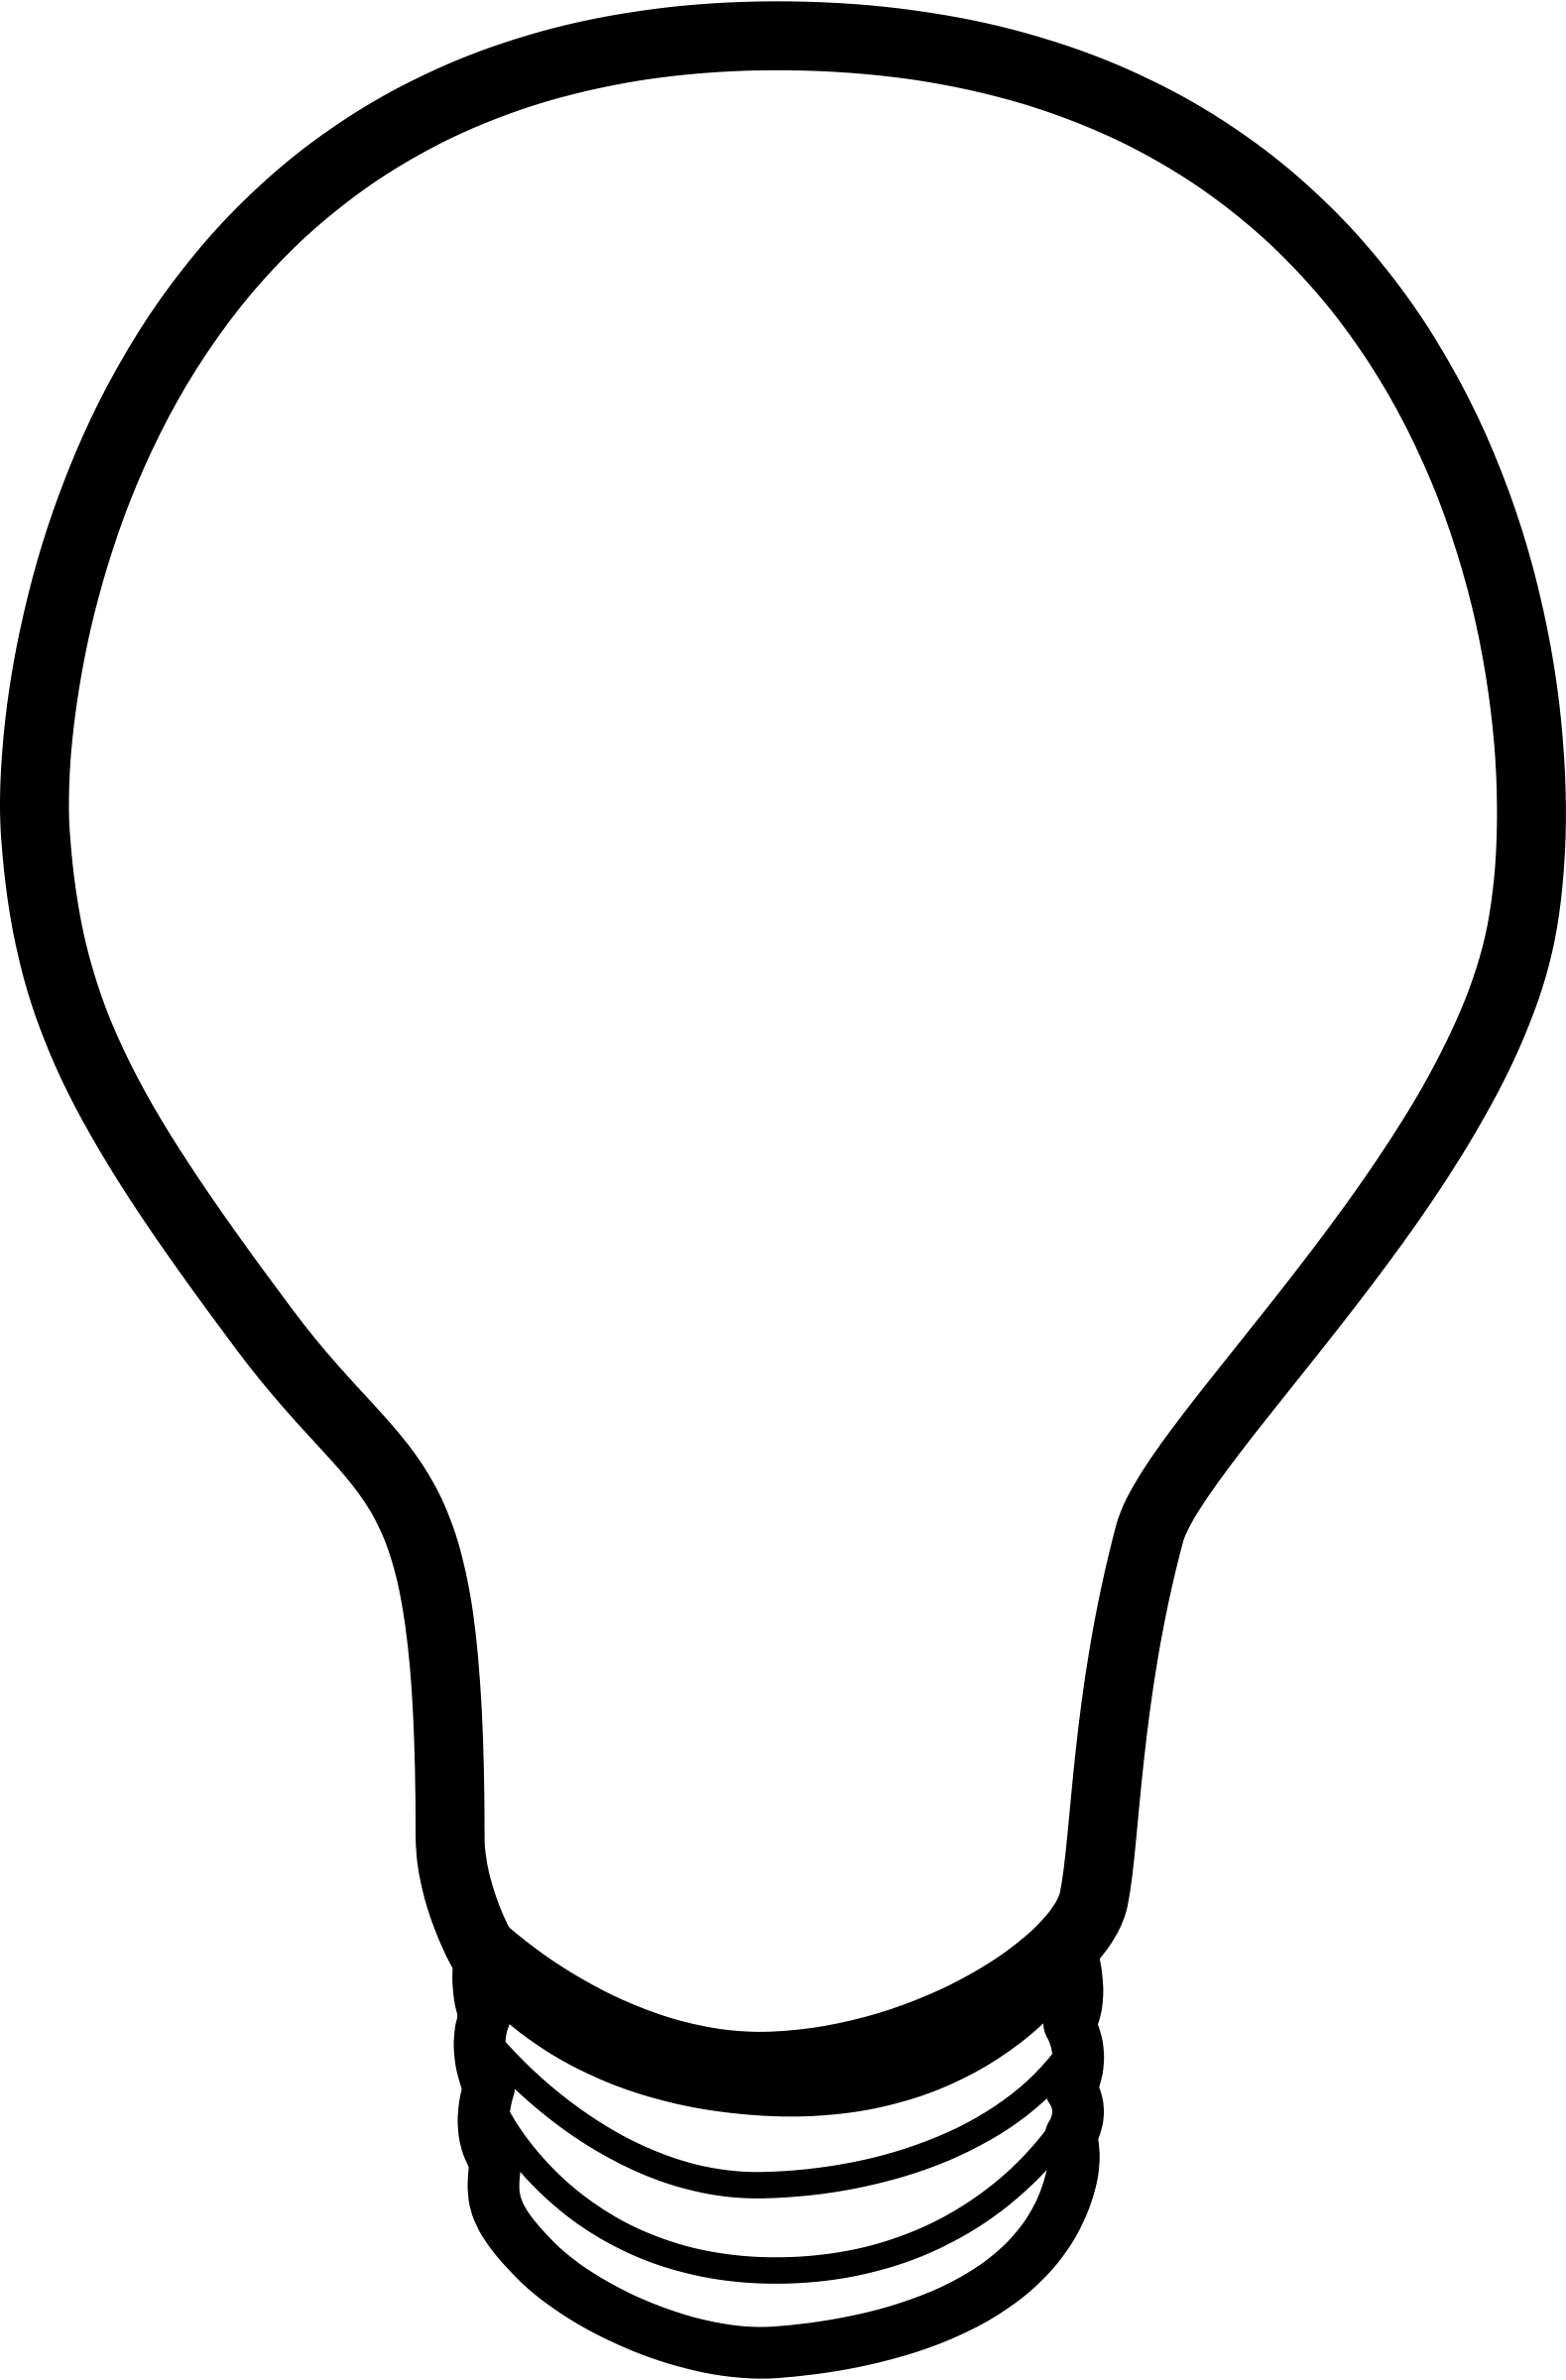 Light bulb clip art silhouette. Drawing clipart panda free